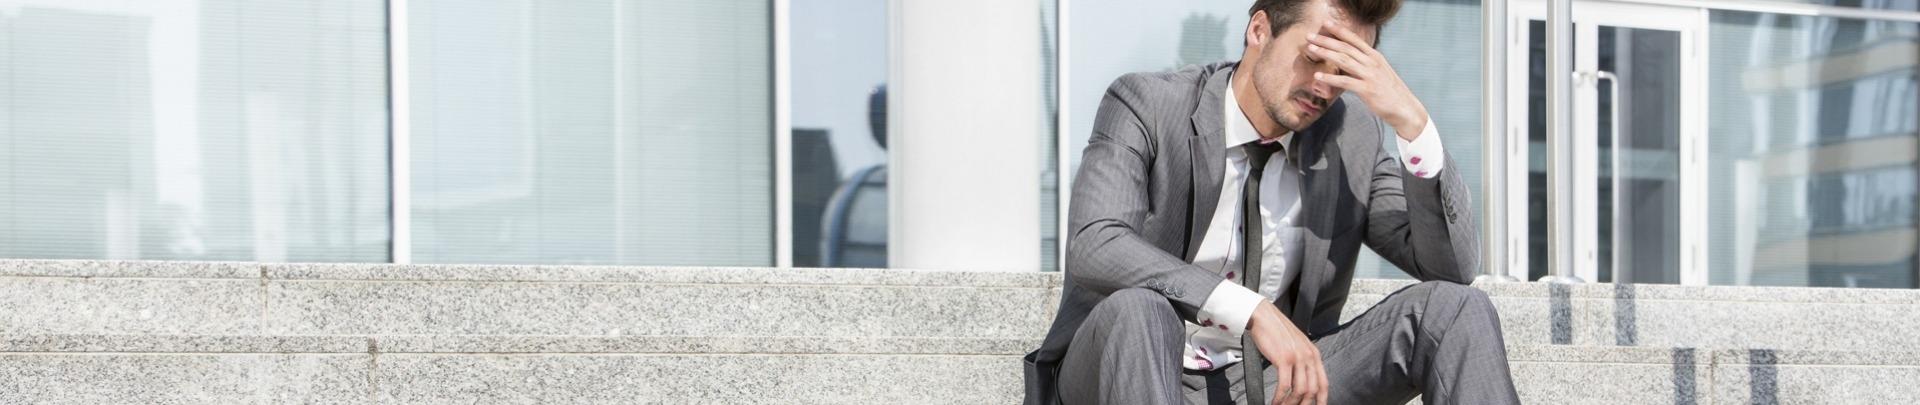 Man op trap met burnout